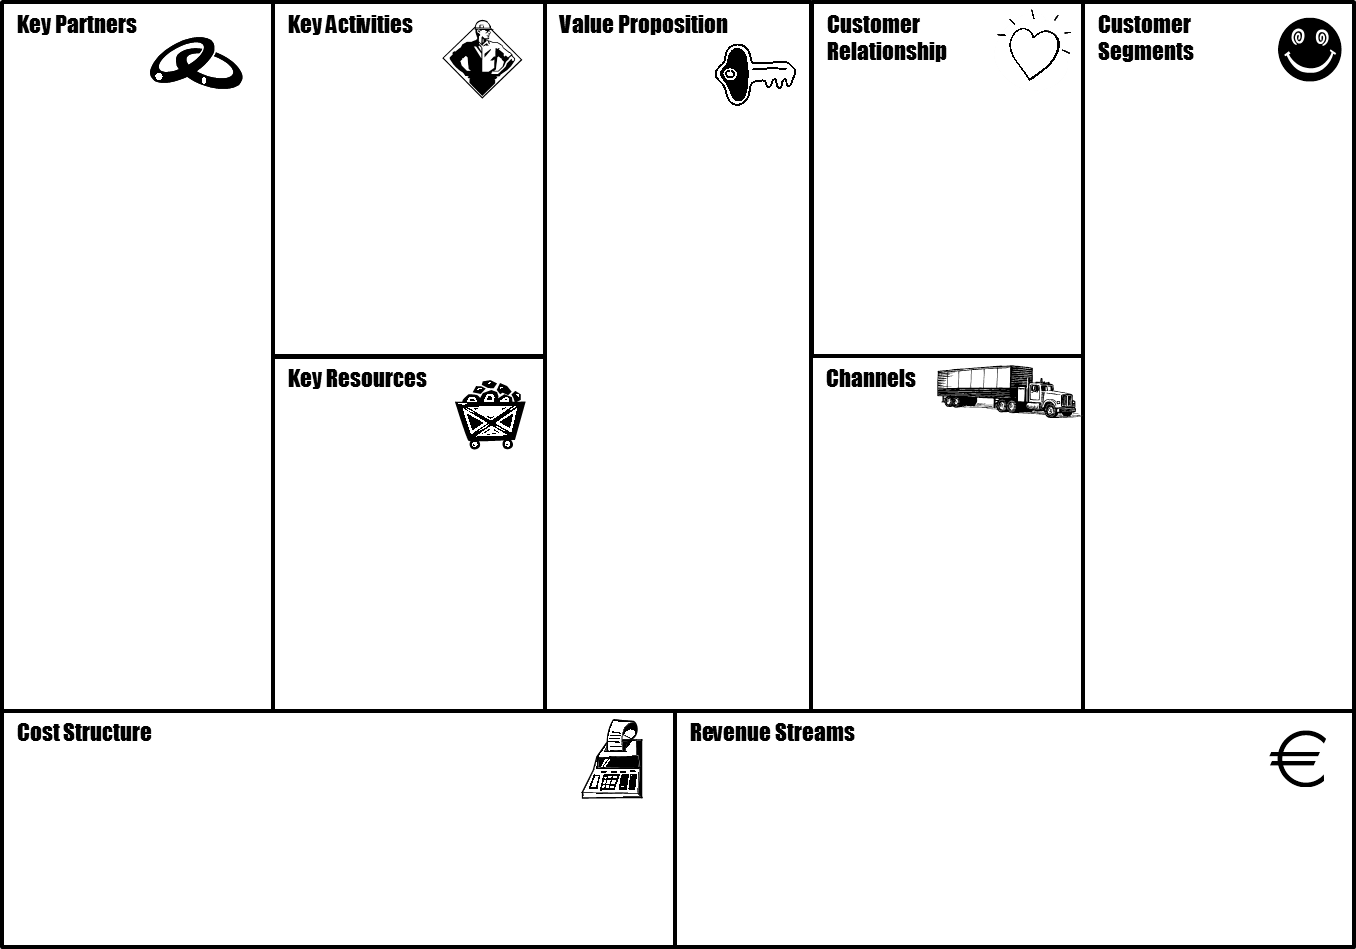 Business Model Canvas En Business Model Canvas What Is Business Model Business